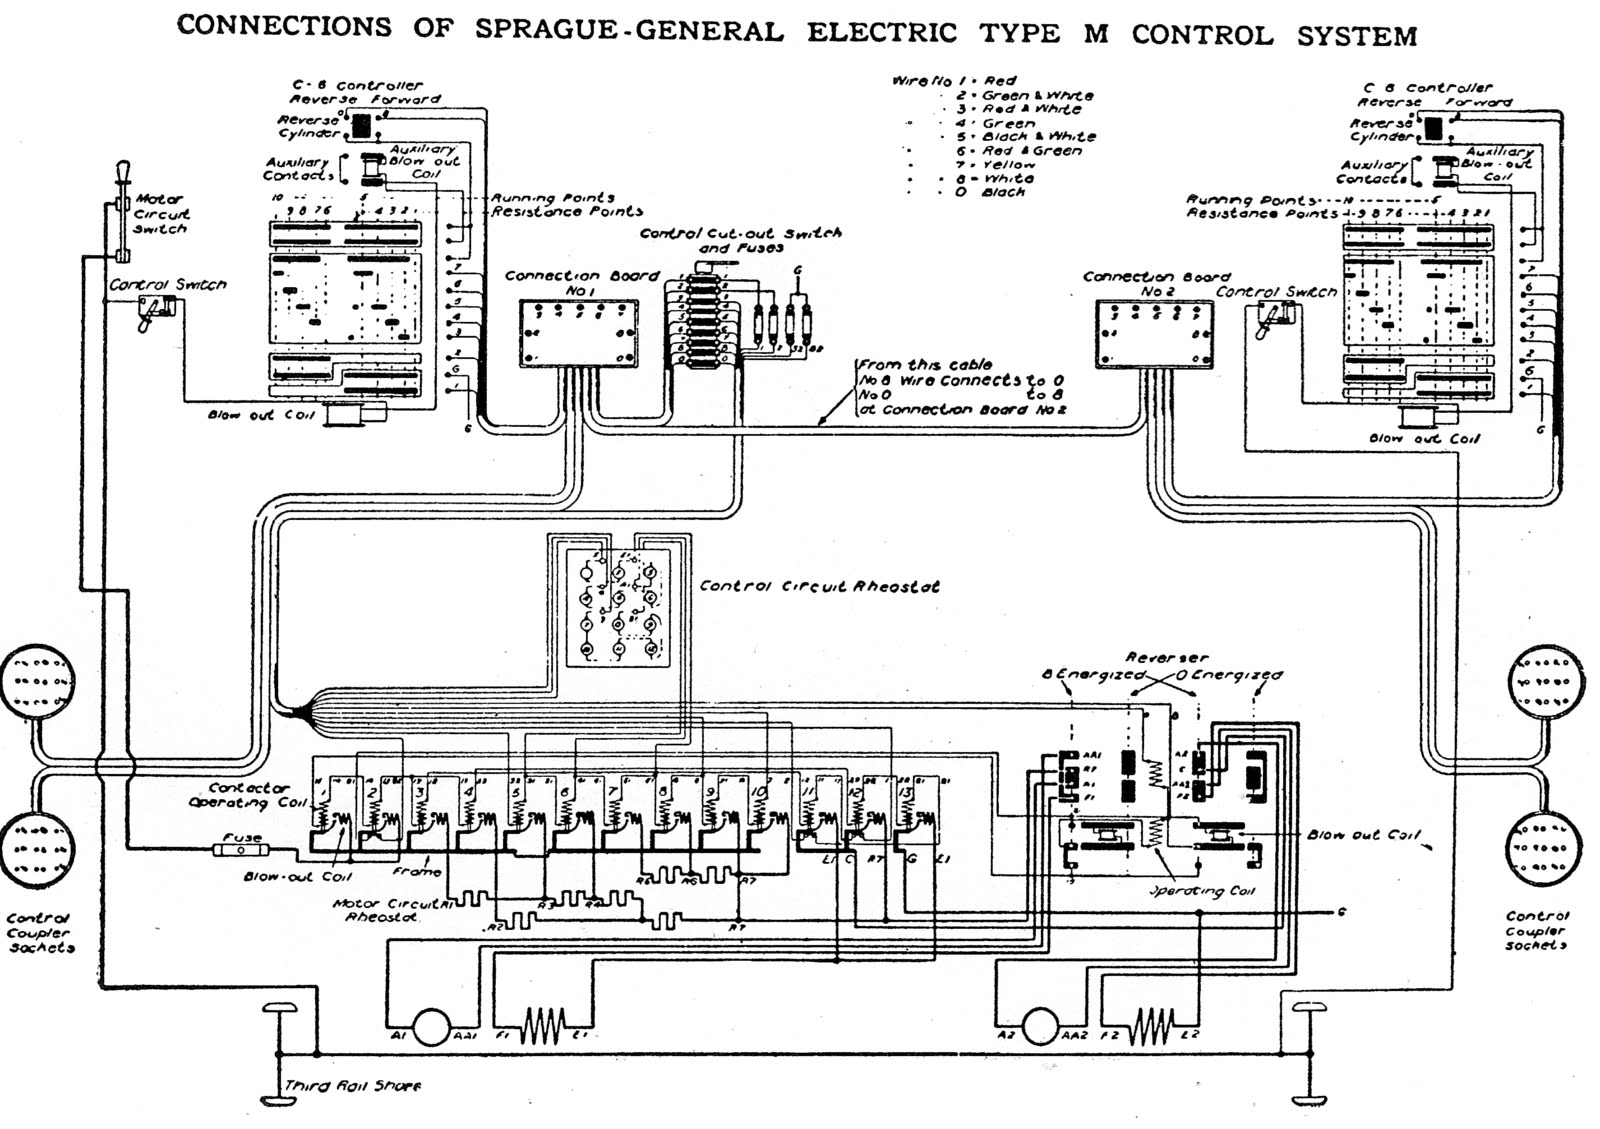 2005 polari sportsman 600 wiring diagram [ 1600 x 1129 Pixel ]